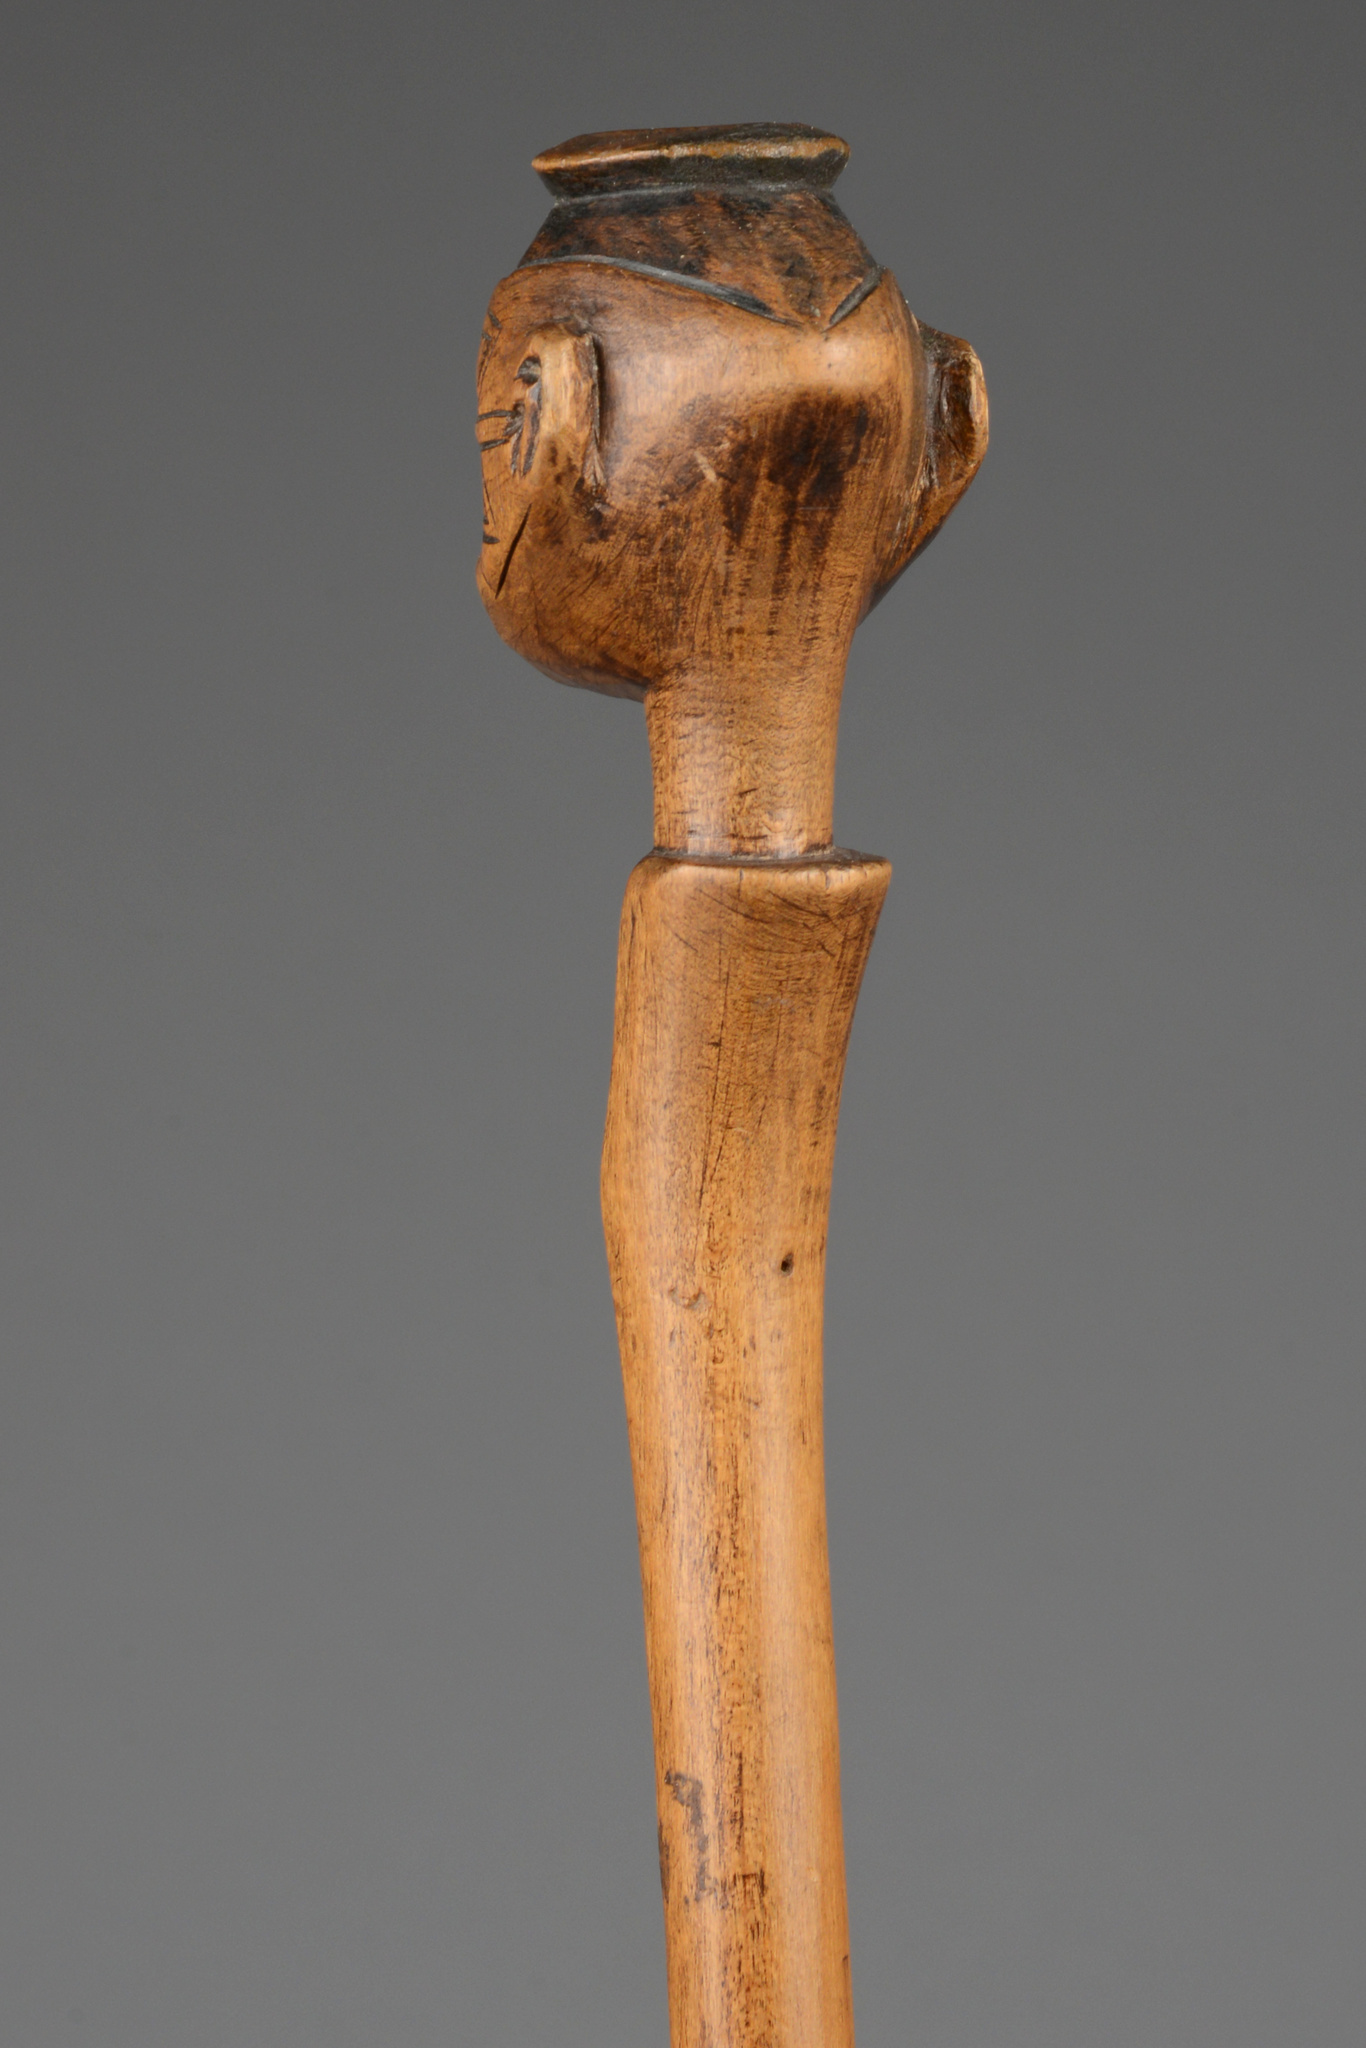 Staff with anthropomorphic head